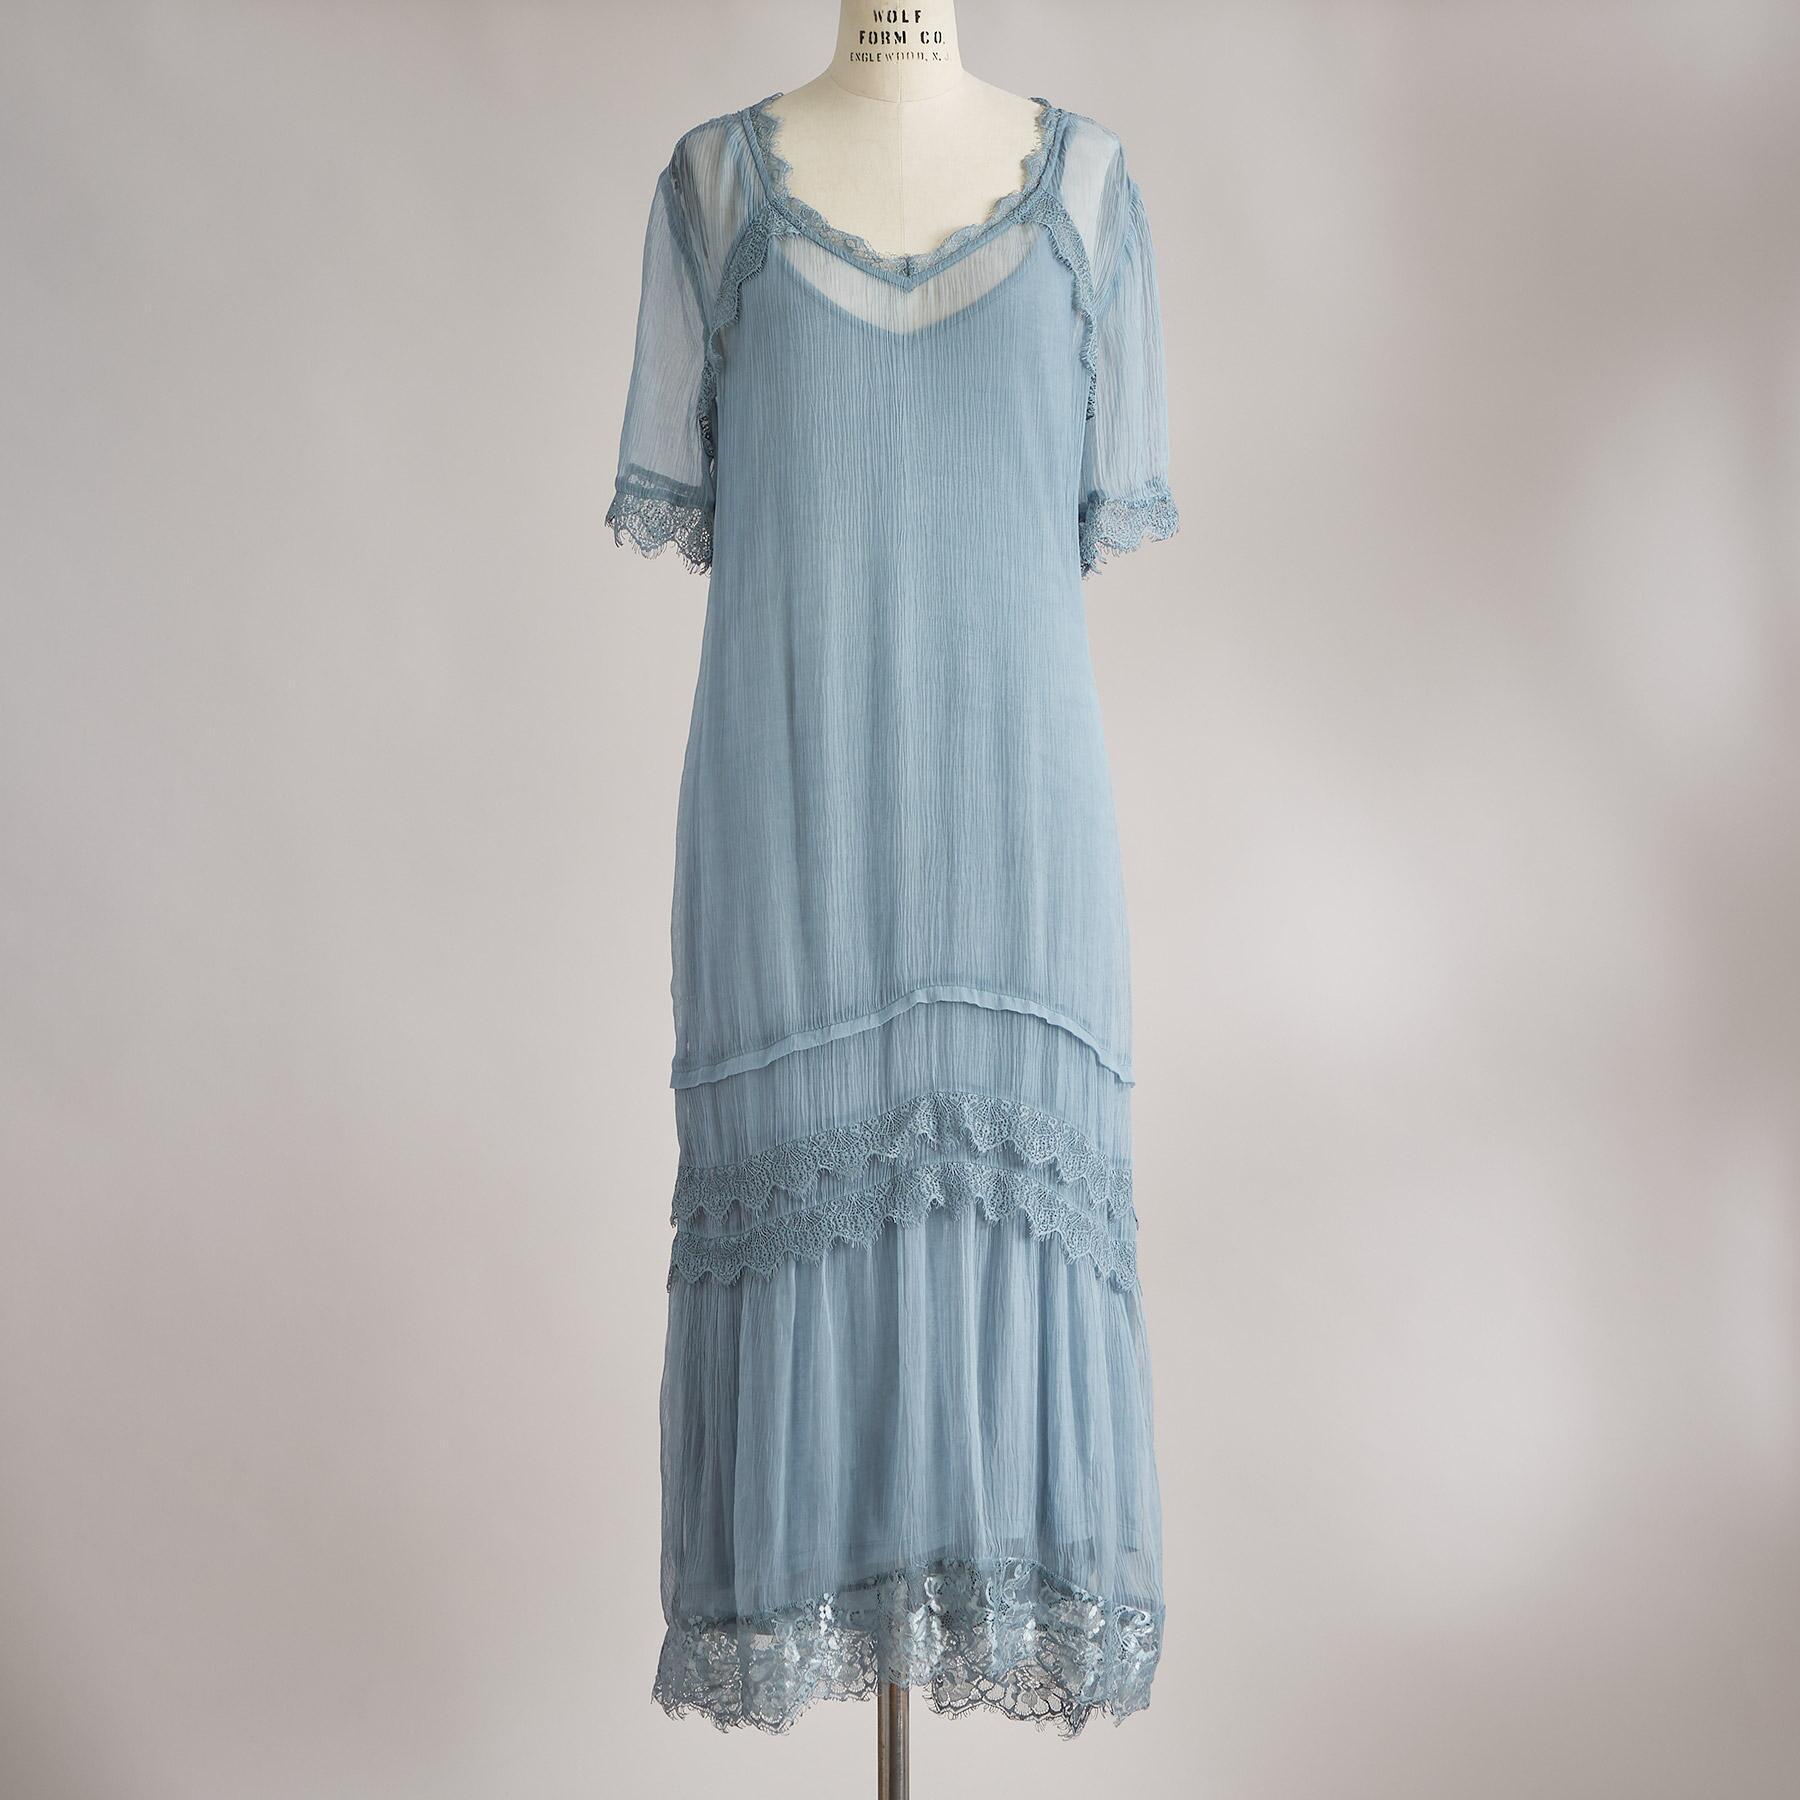 GILDA DRESS - PETITES: View 2